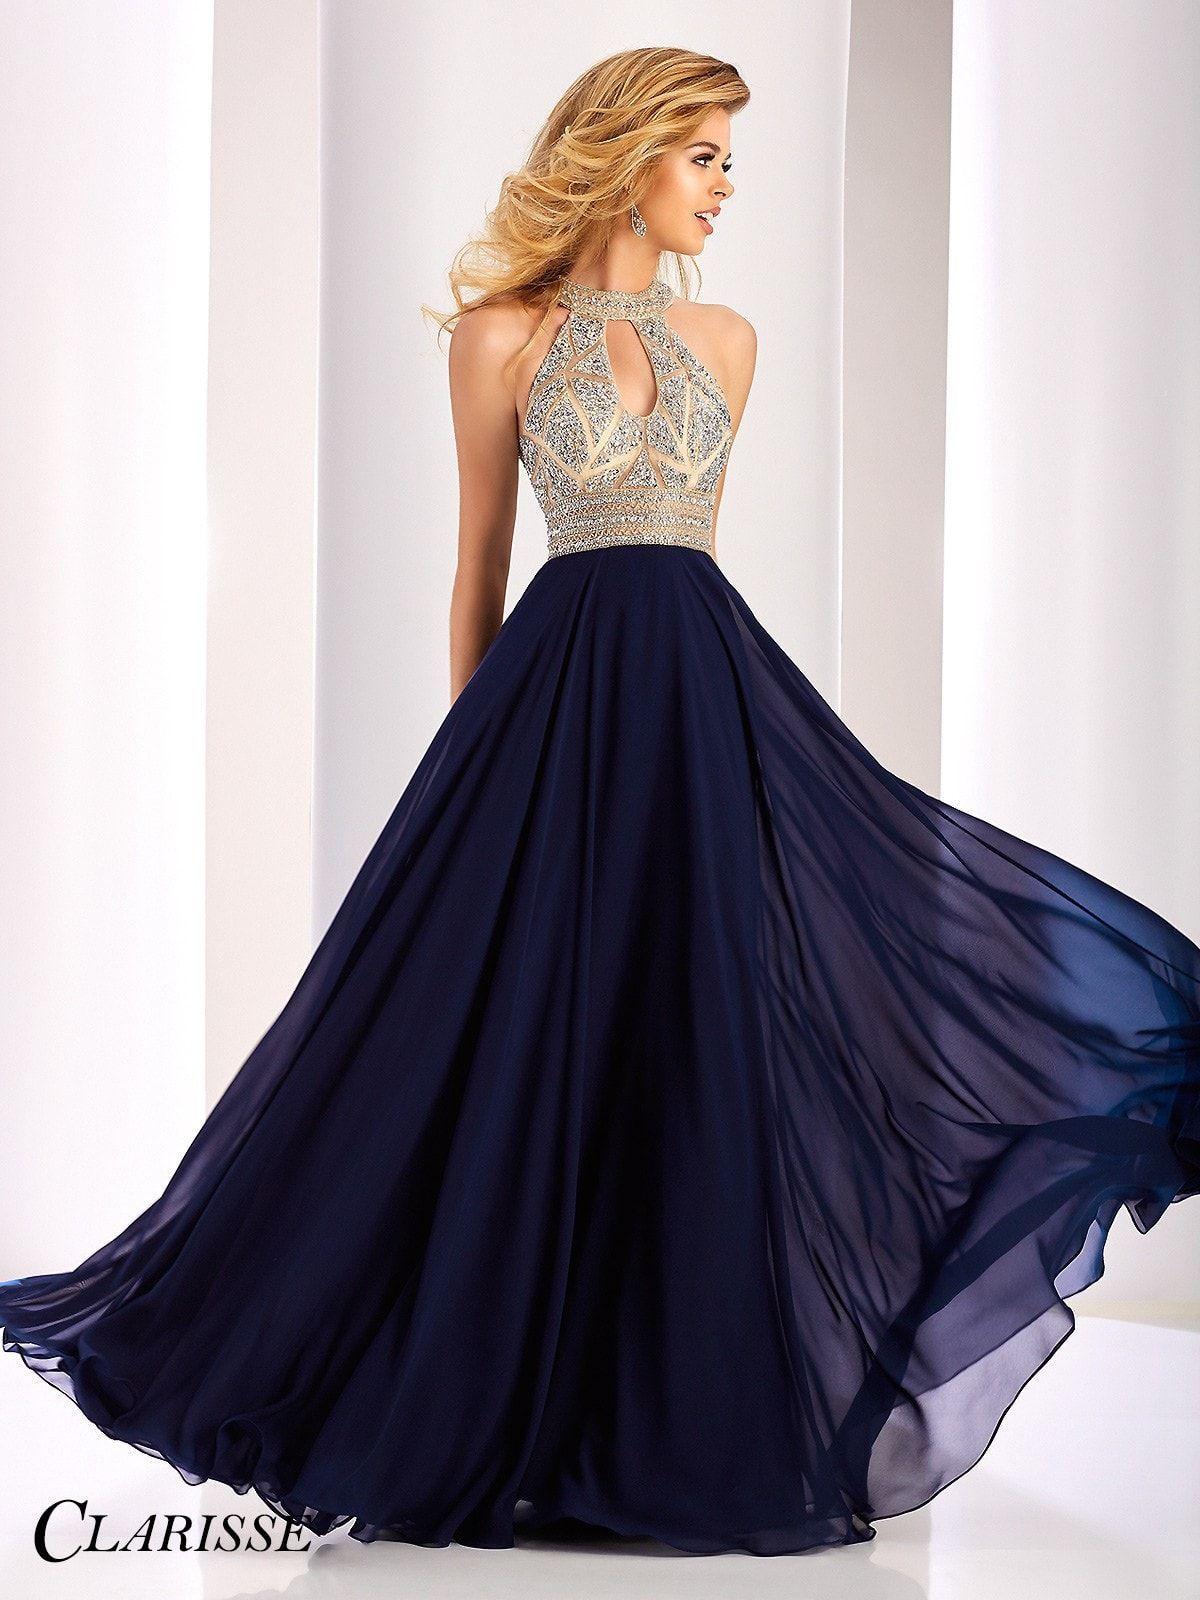 Clarisse prom navy high neckline open back chiffon prom dress